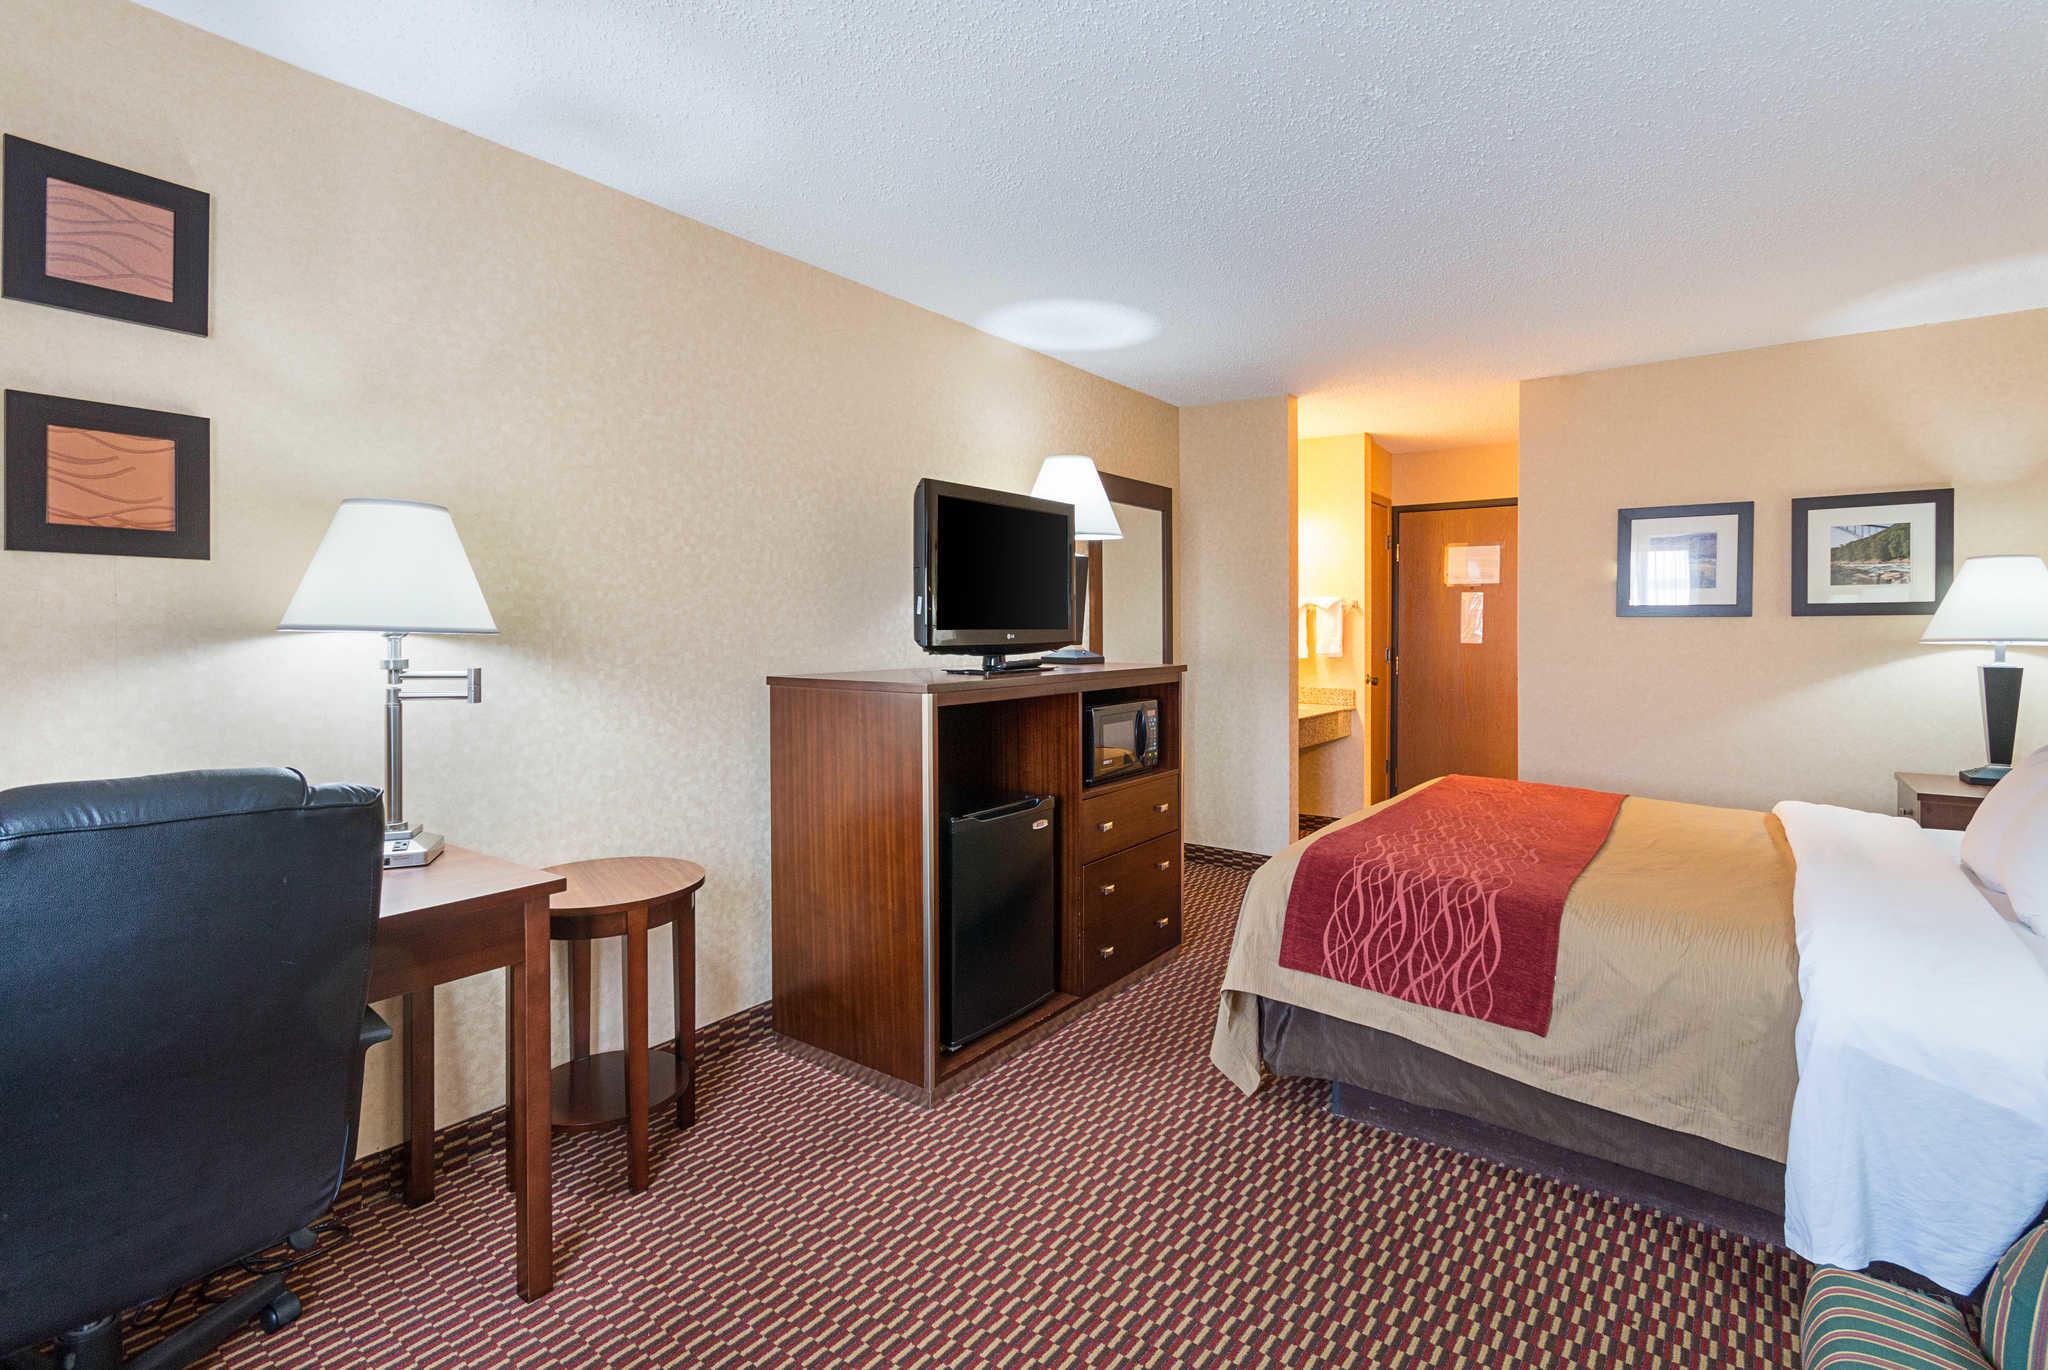 Rooms To Rent Vienna Wv